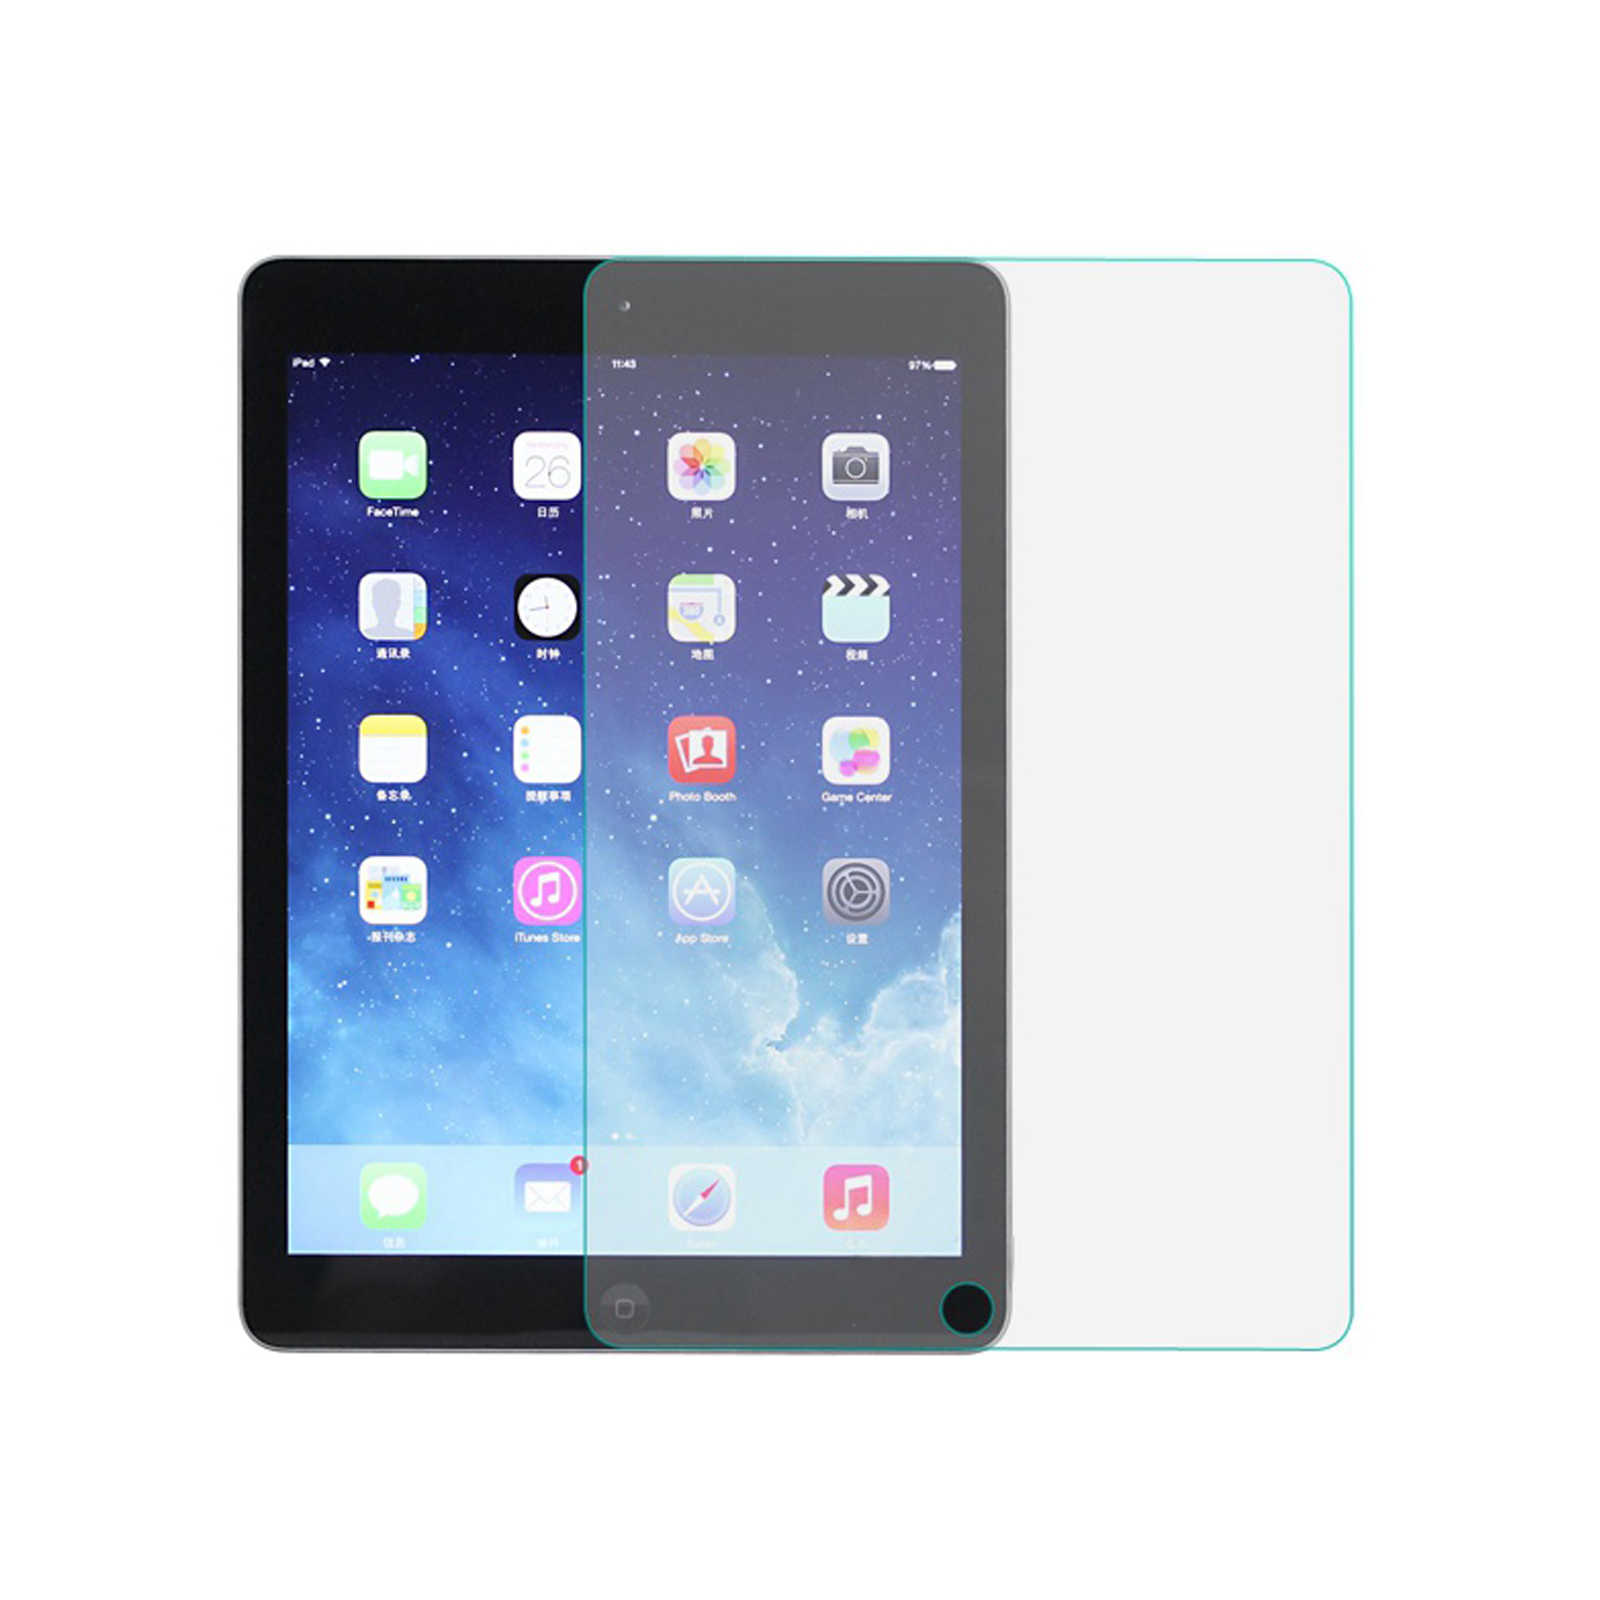 9 H szkło hartowane Screen Protector 9.7 cal Film dla ipad 2 3 4 air 1 2 pro folia ochronna 7.9 cal dla ipad mini 1 2 3 4 pod